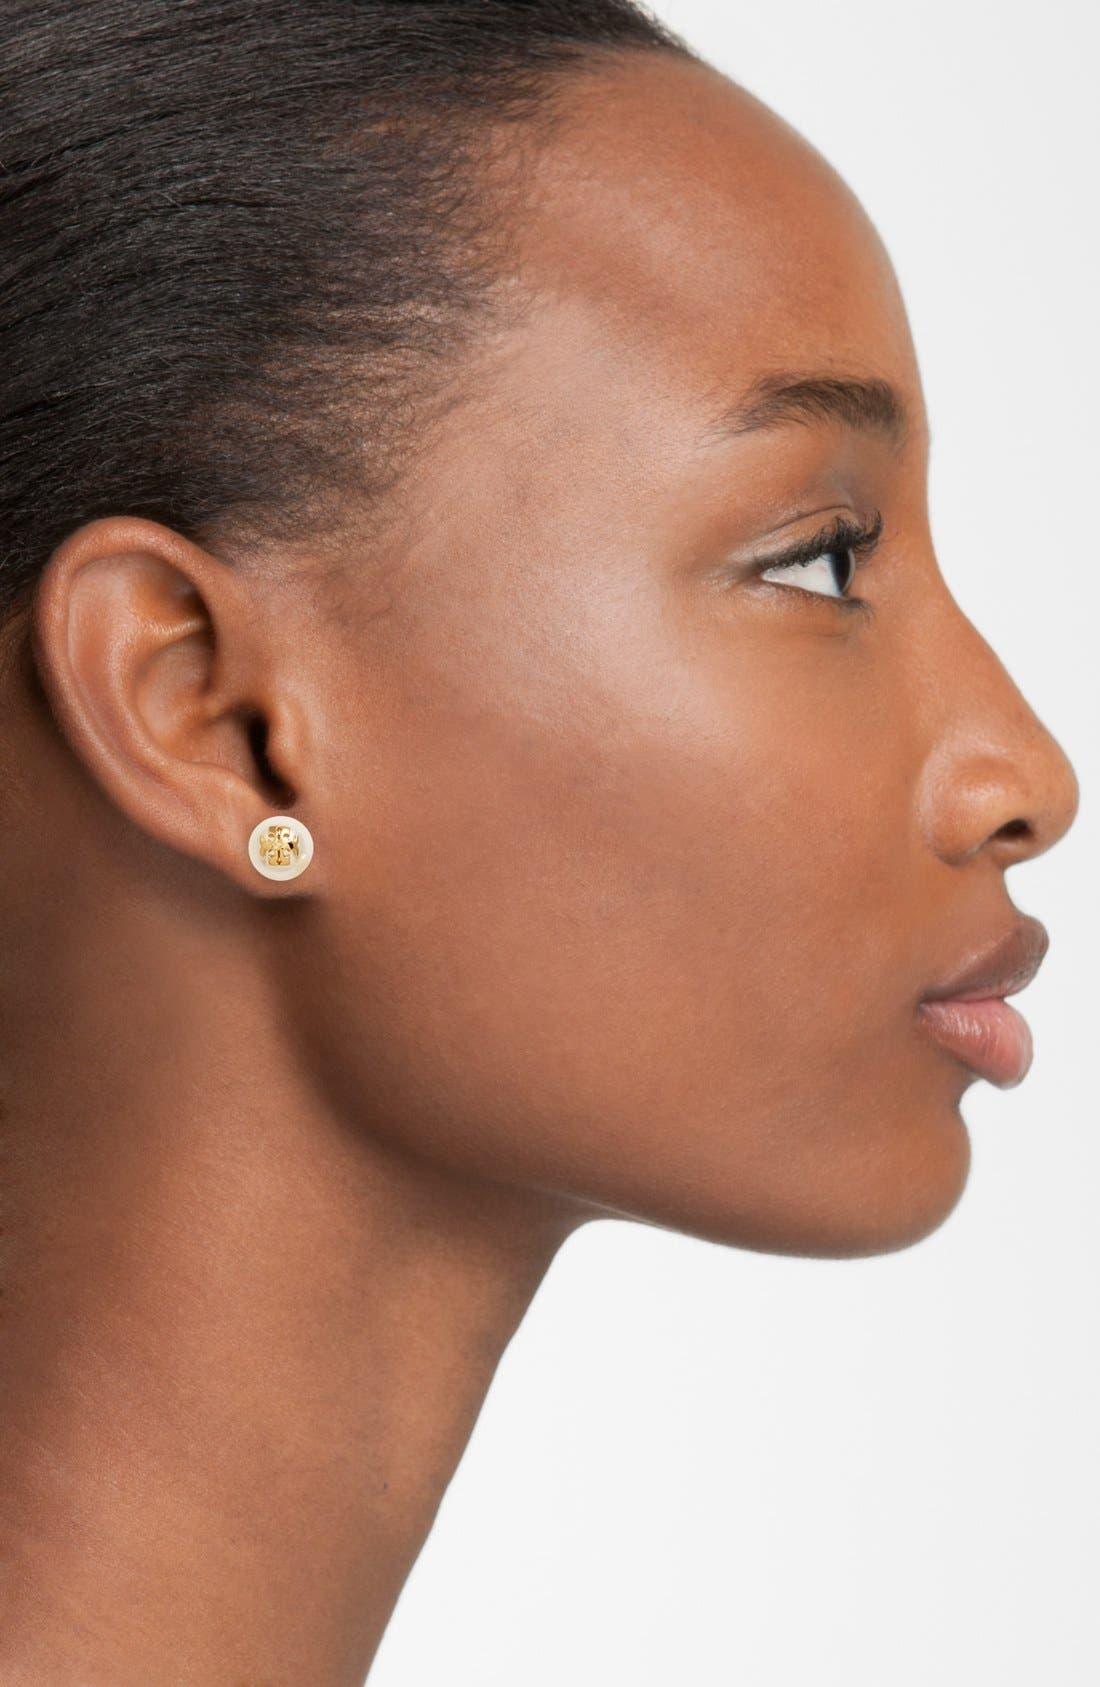 TORY BURCH, Swarovski Crystal Pearl Logo Stud Earrings, Alternate thumbnail 2, color, IVORY/ TORY GOLD